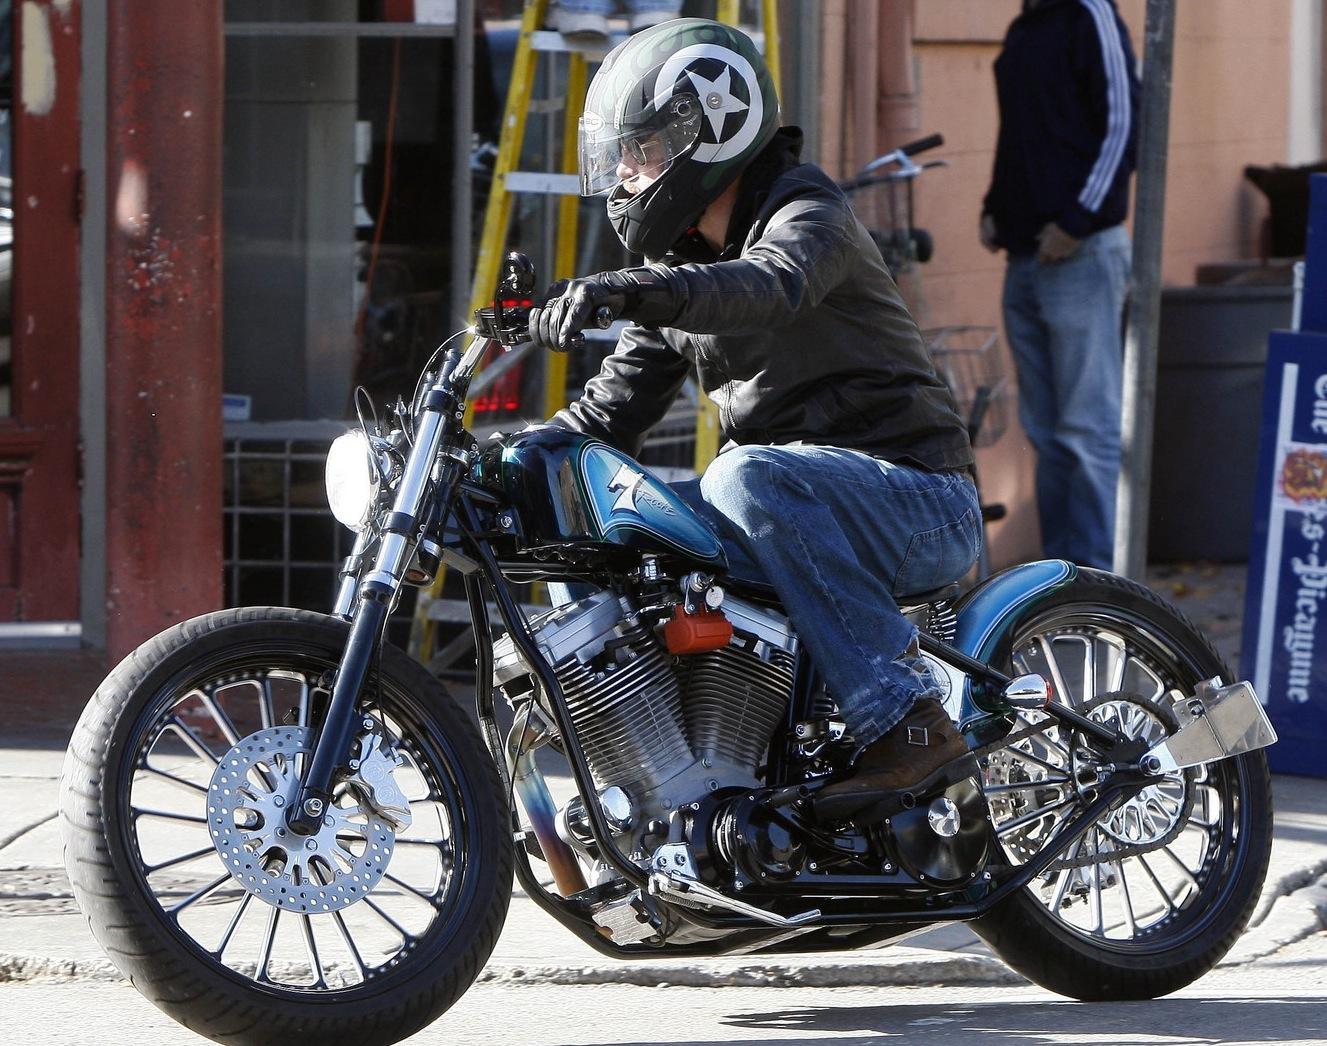 http://3.bp.blogspot.com/_NRqzHM85DXo/S6vwlz_2mDI/AAAAAAAAAtE/LH35igihKiE/s1600/brad-pitt-rides-new-custom-motorcycle3.jpg